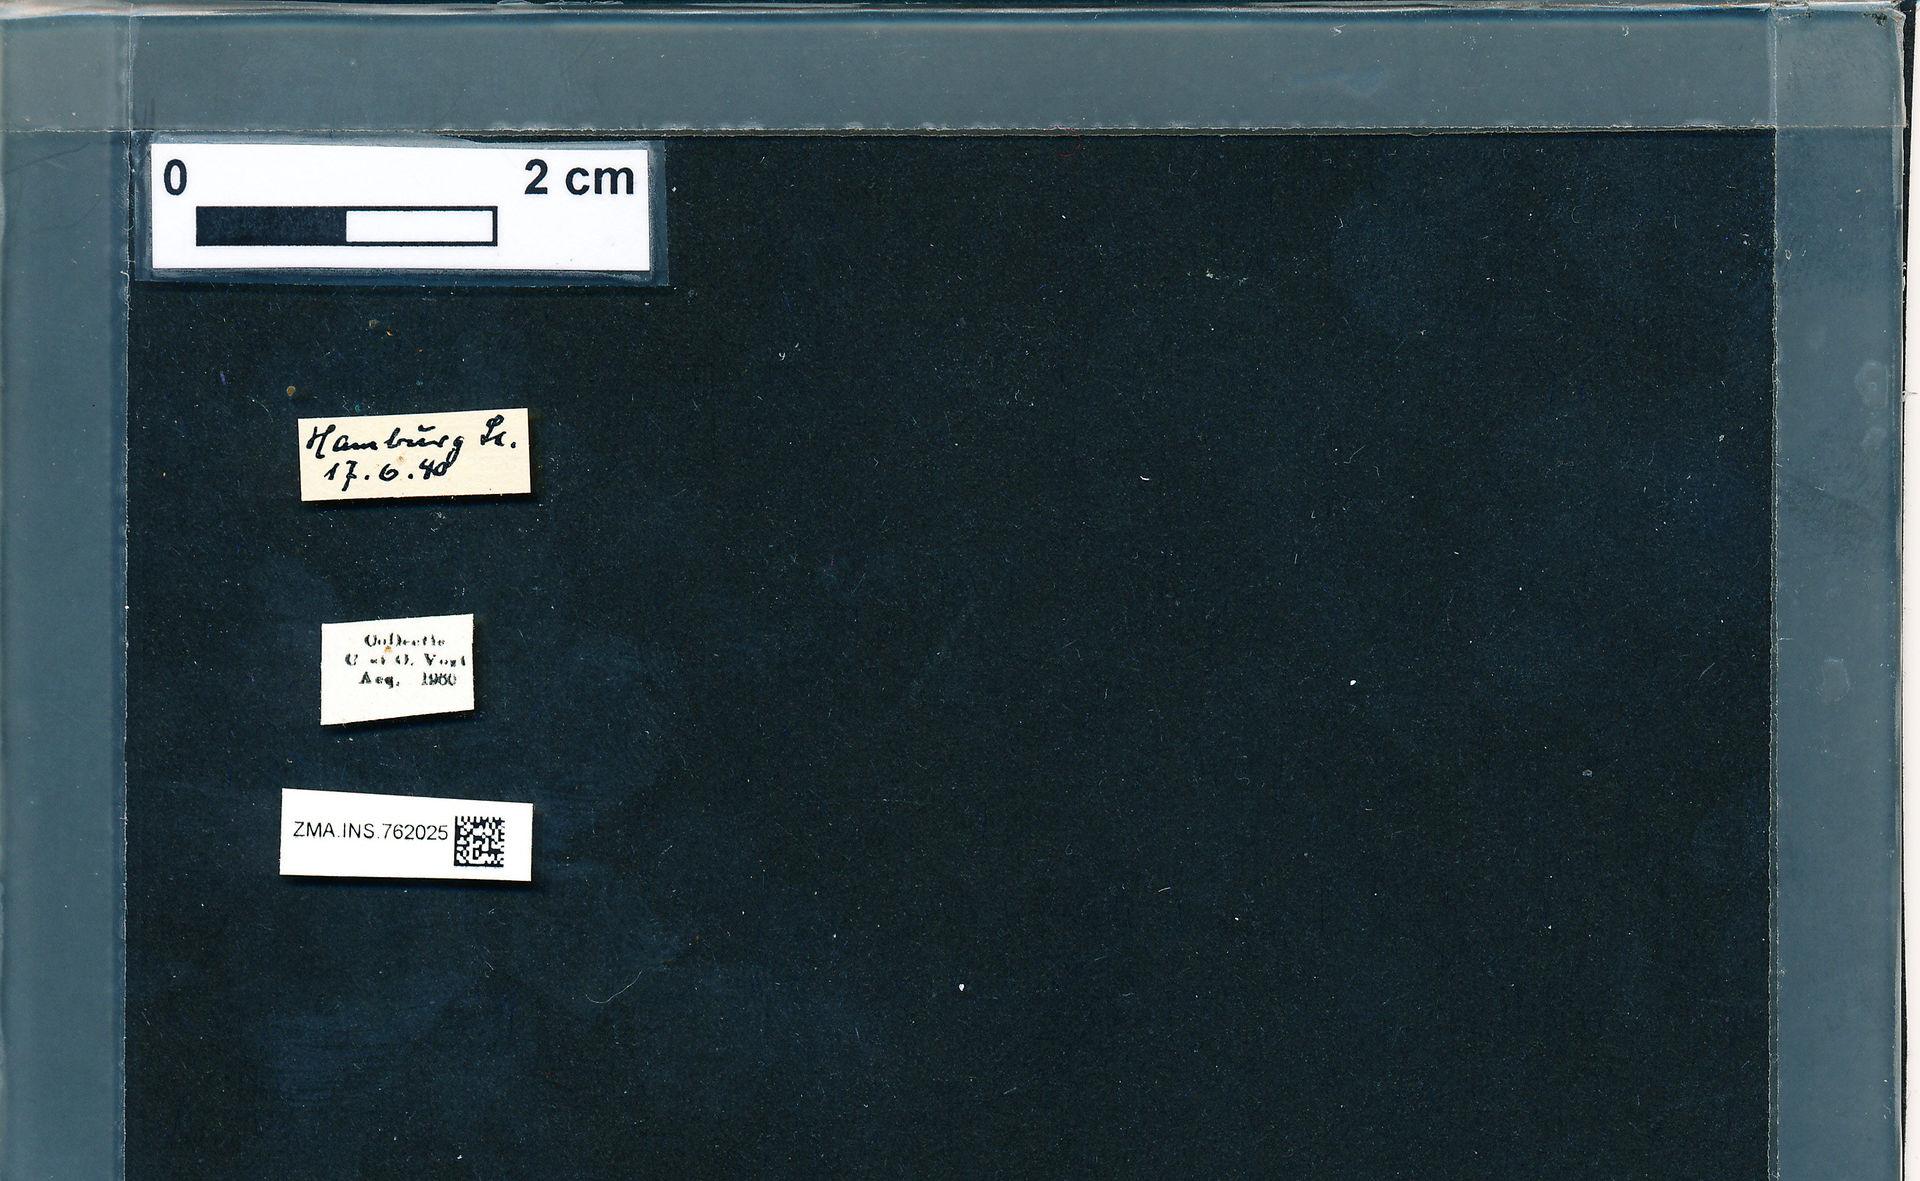 ZMA.INS.762025 | Bombus (Pyrobombus) pratorum pratorum Linnaeus, 1761